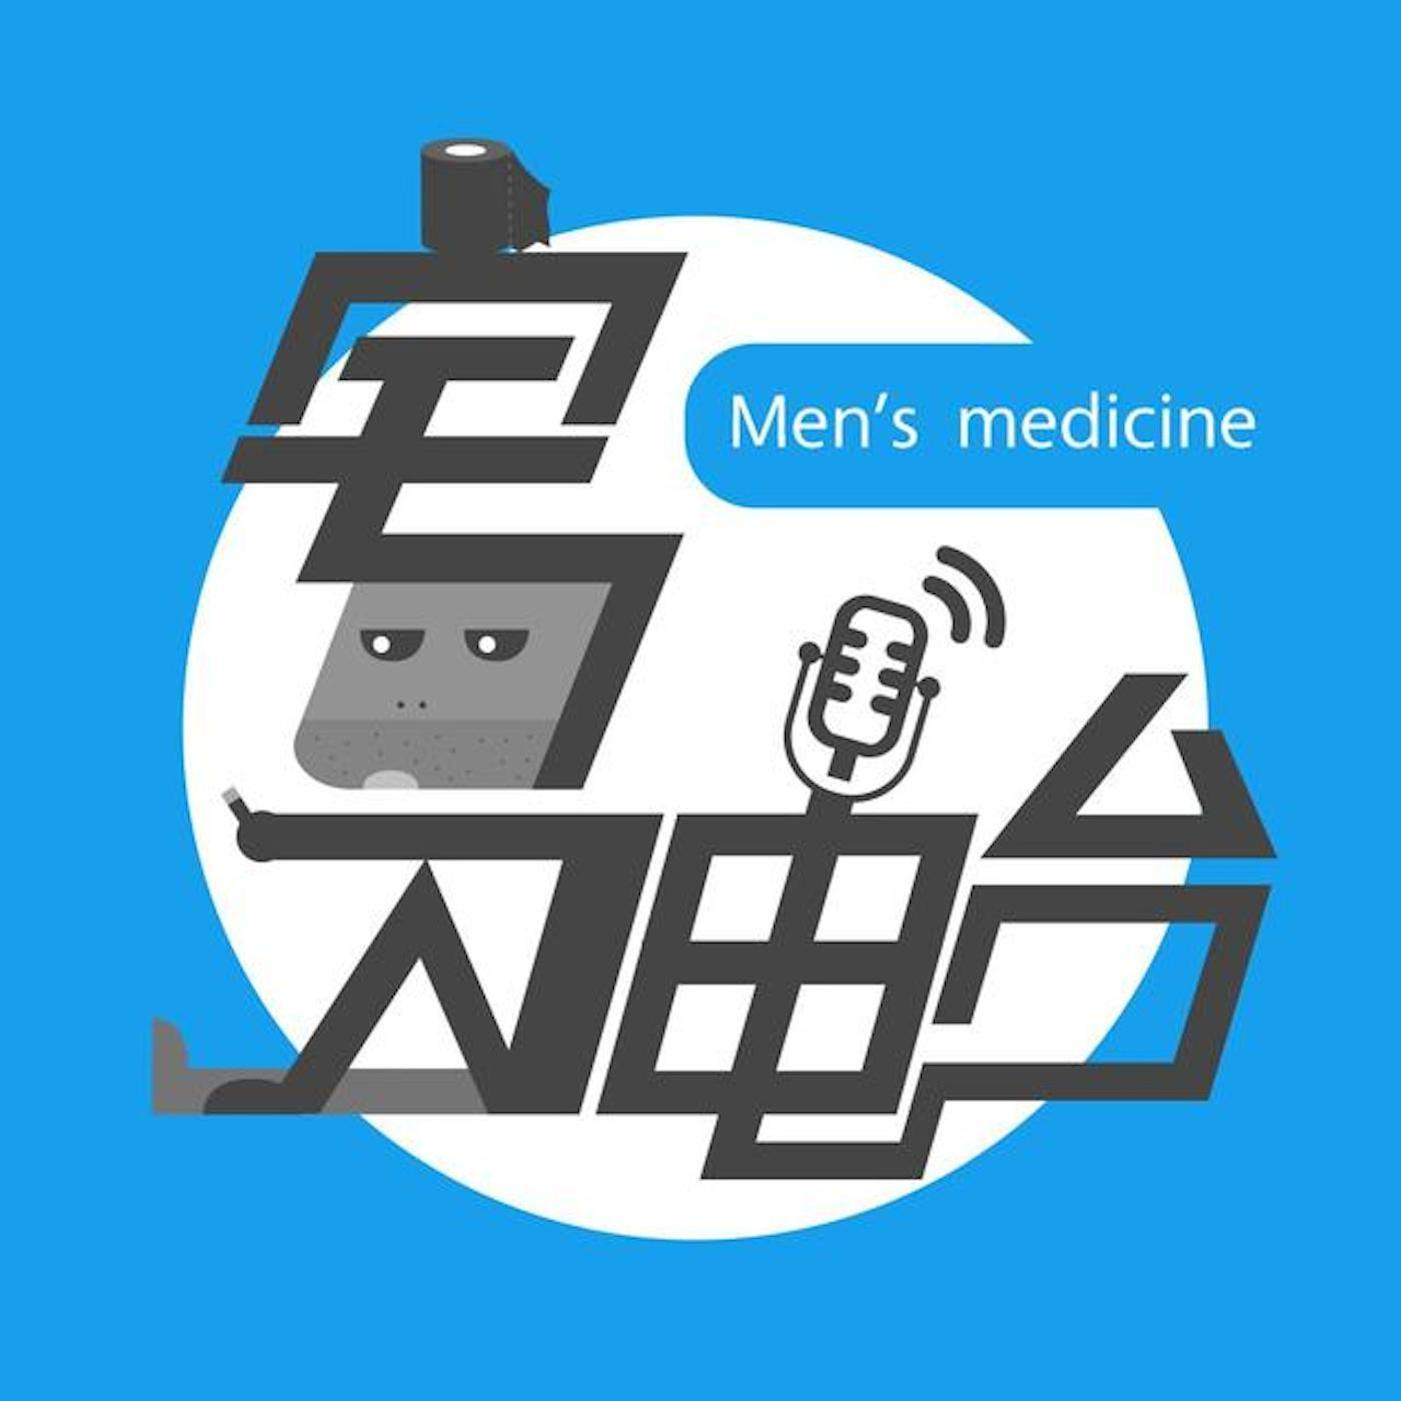 <![CDATA[宅男电台 Men's medicine]]>